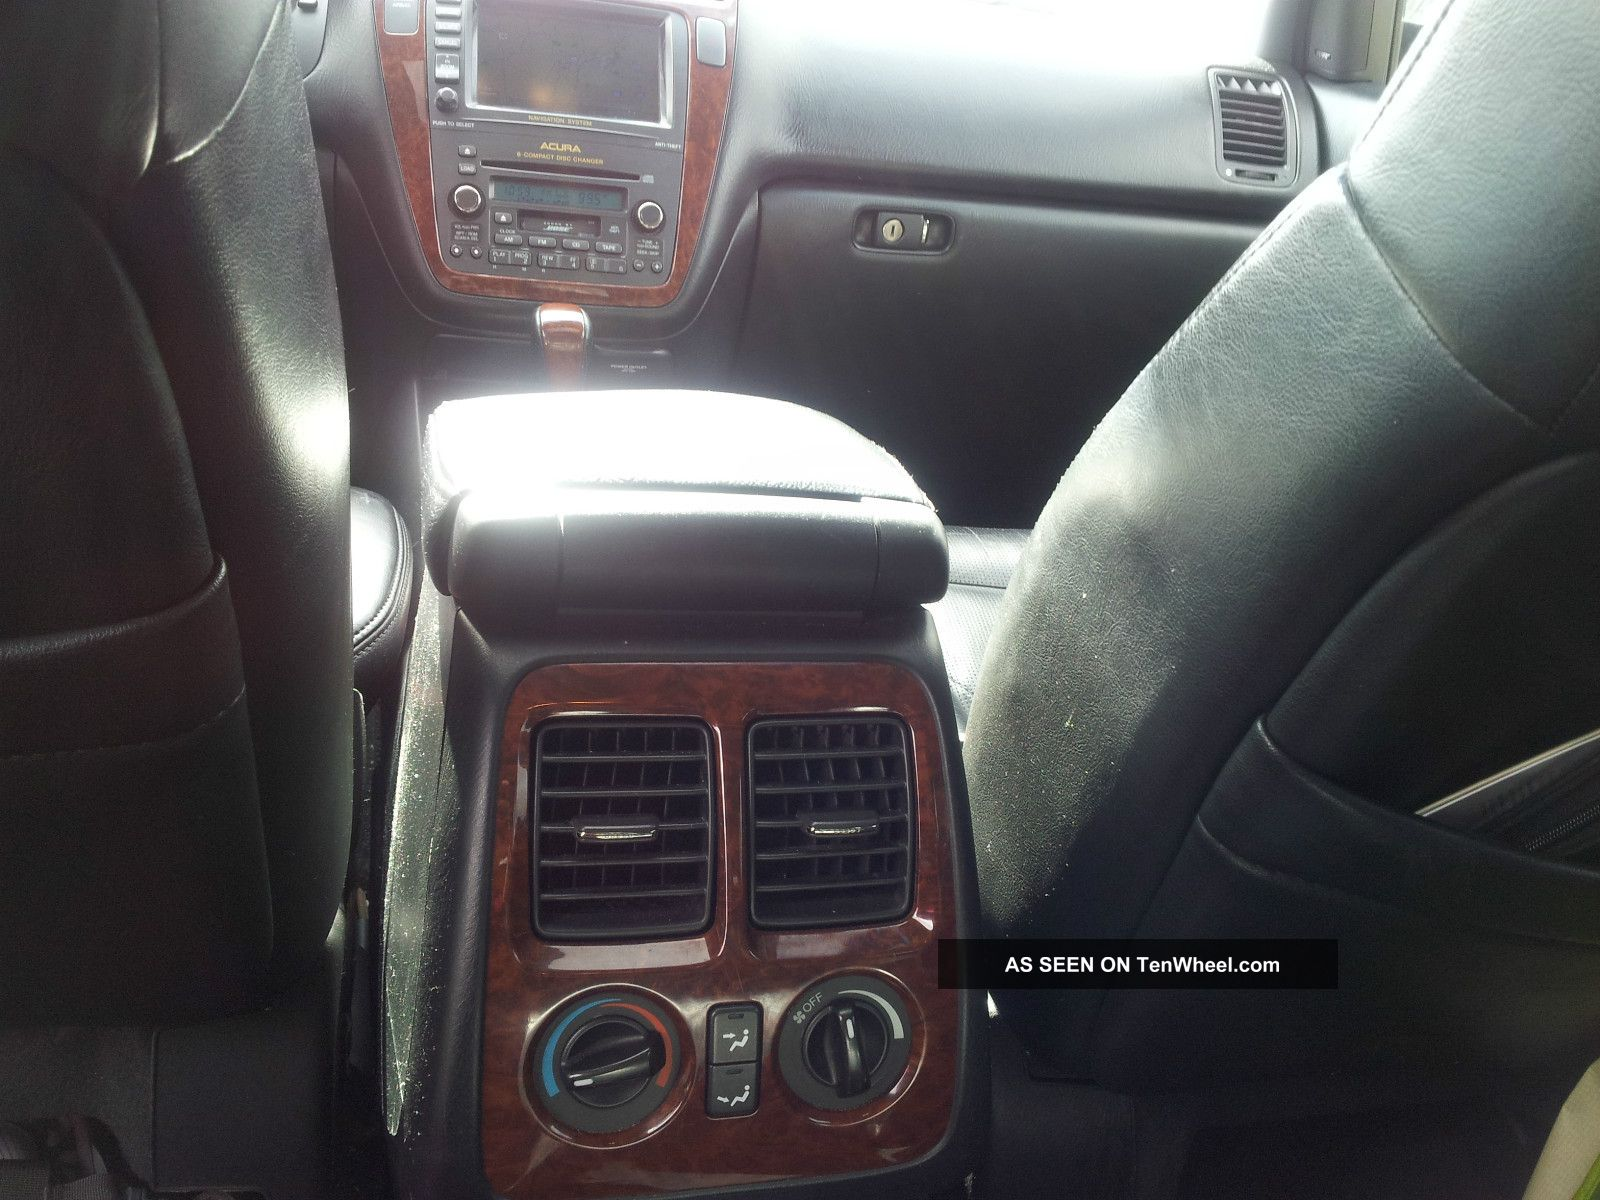 2004 Acura Mdx Touring Sport Utility 4